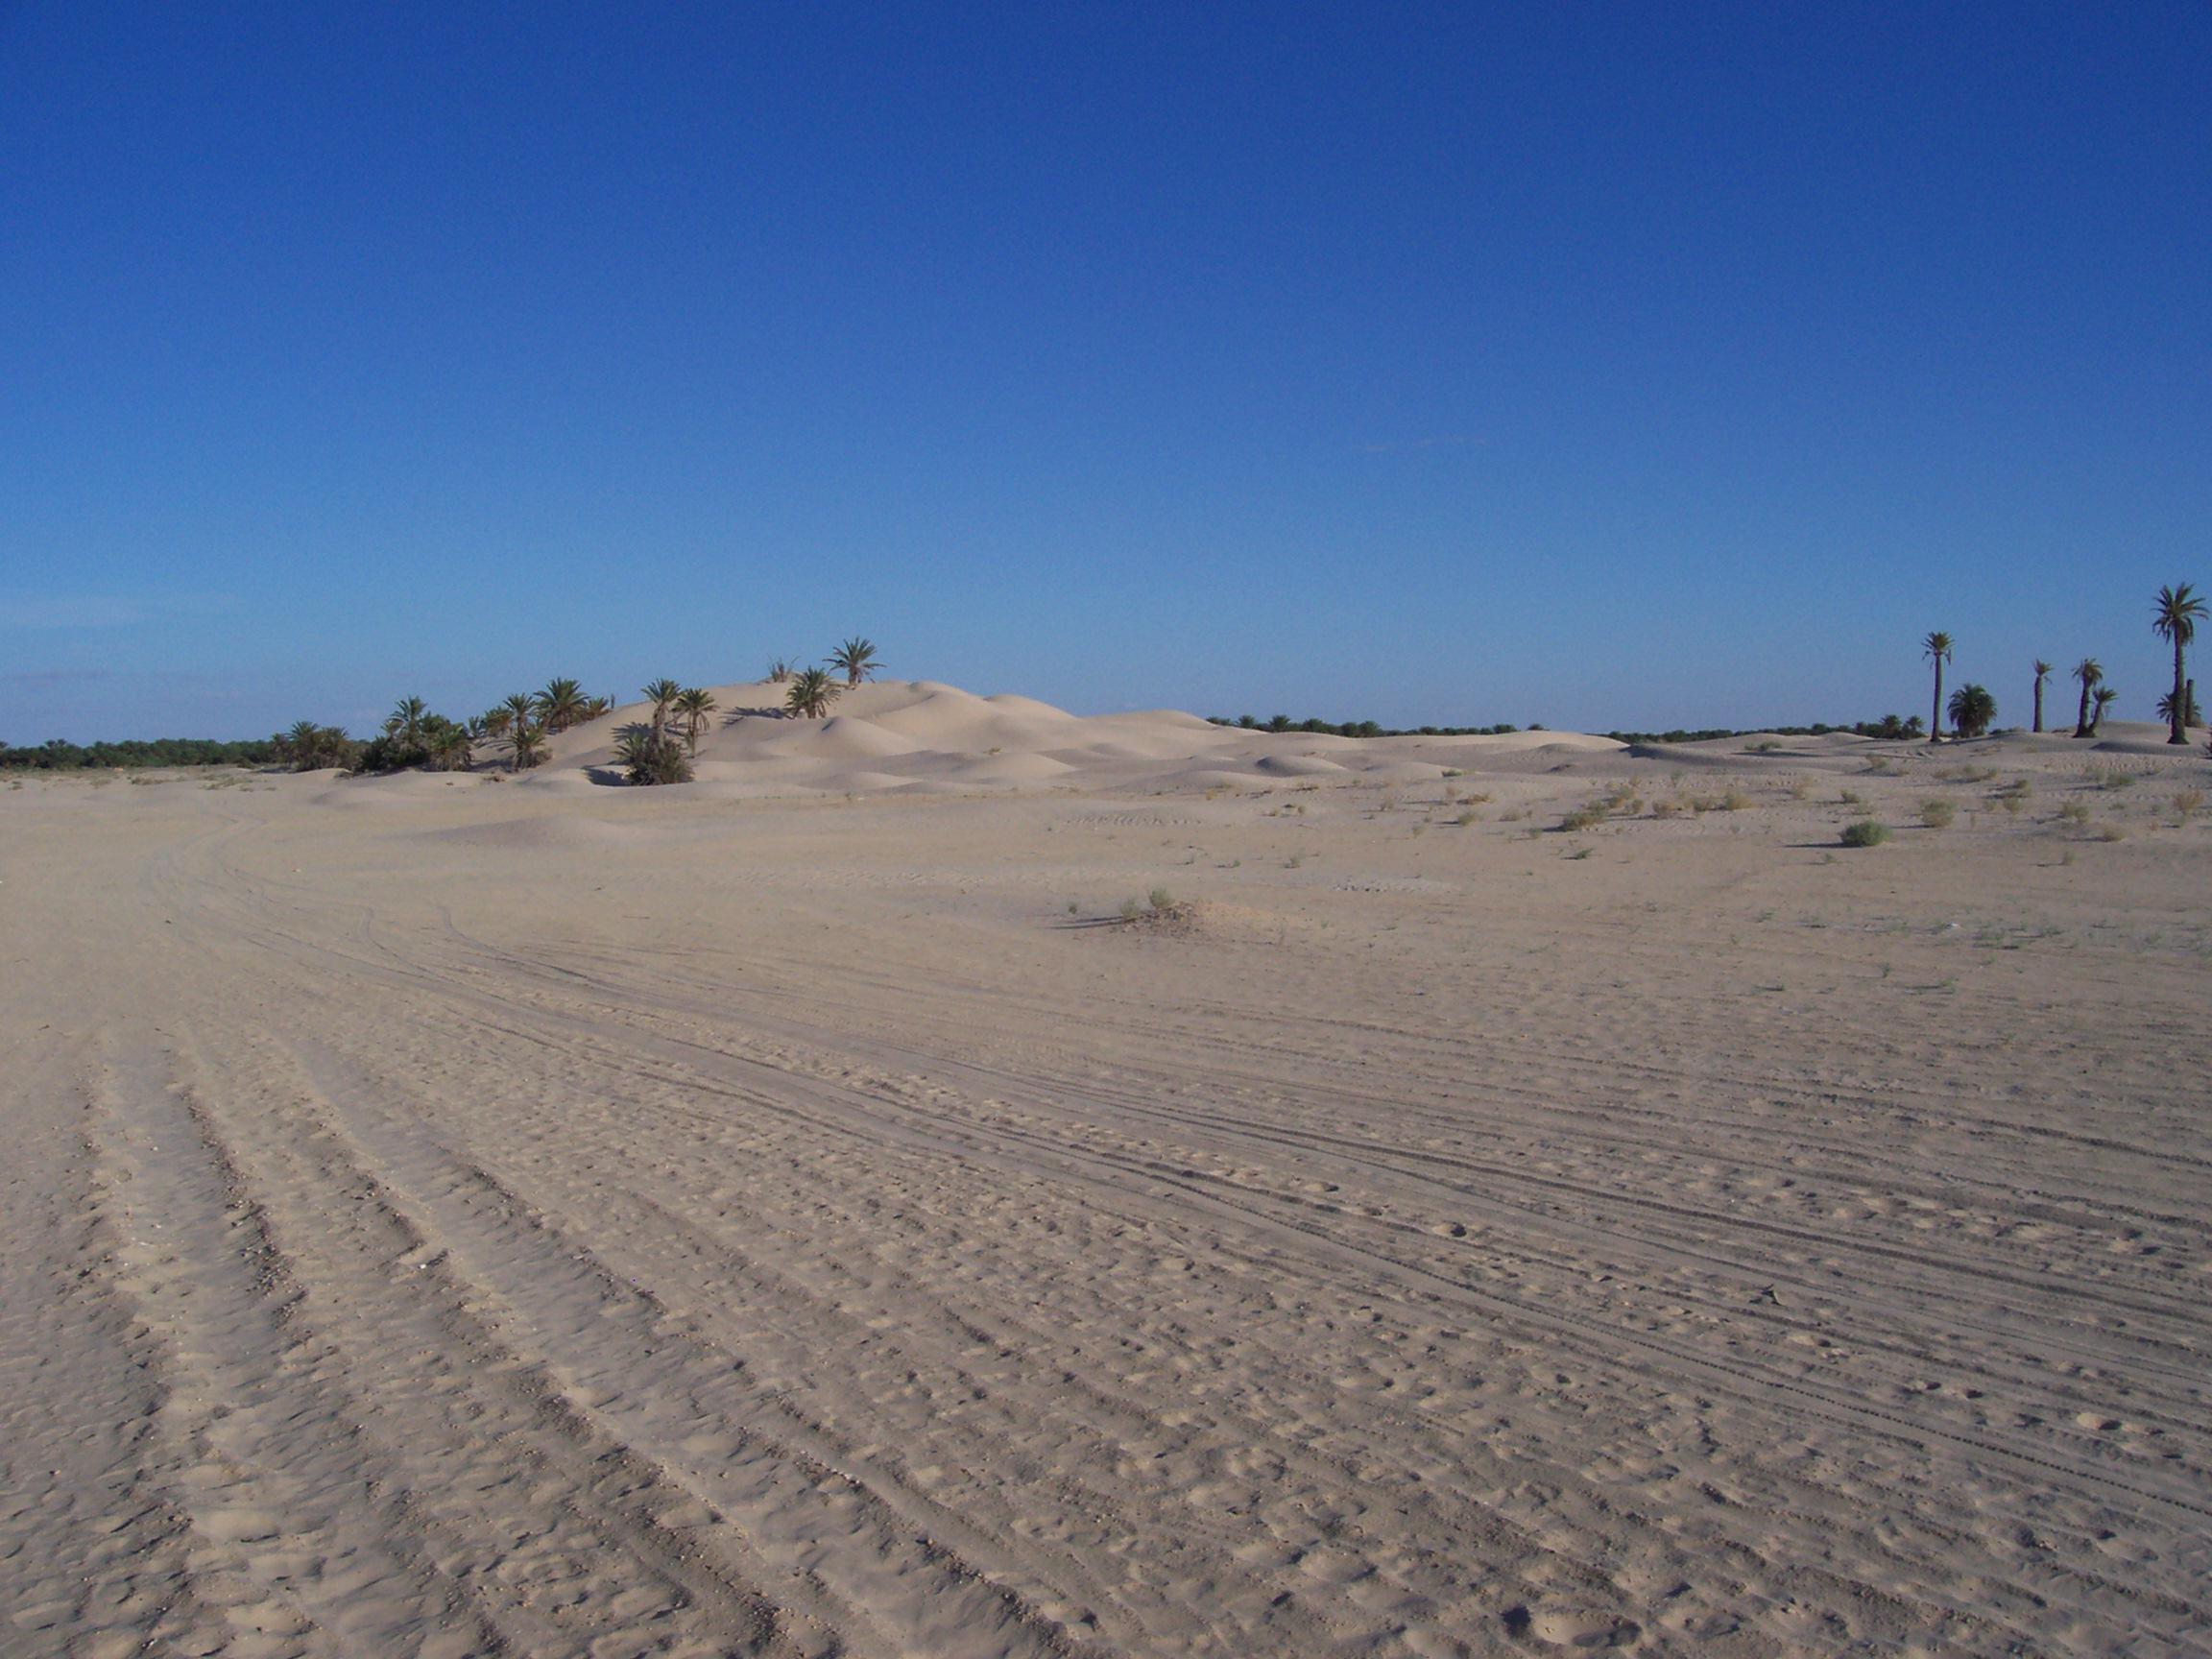 Dune_Zaafrane_Tunisia